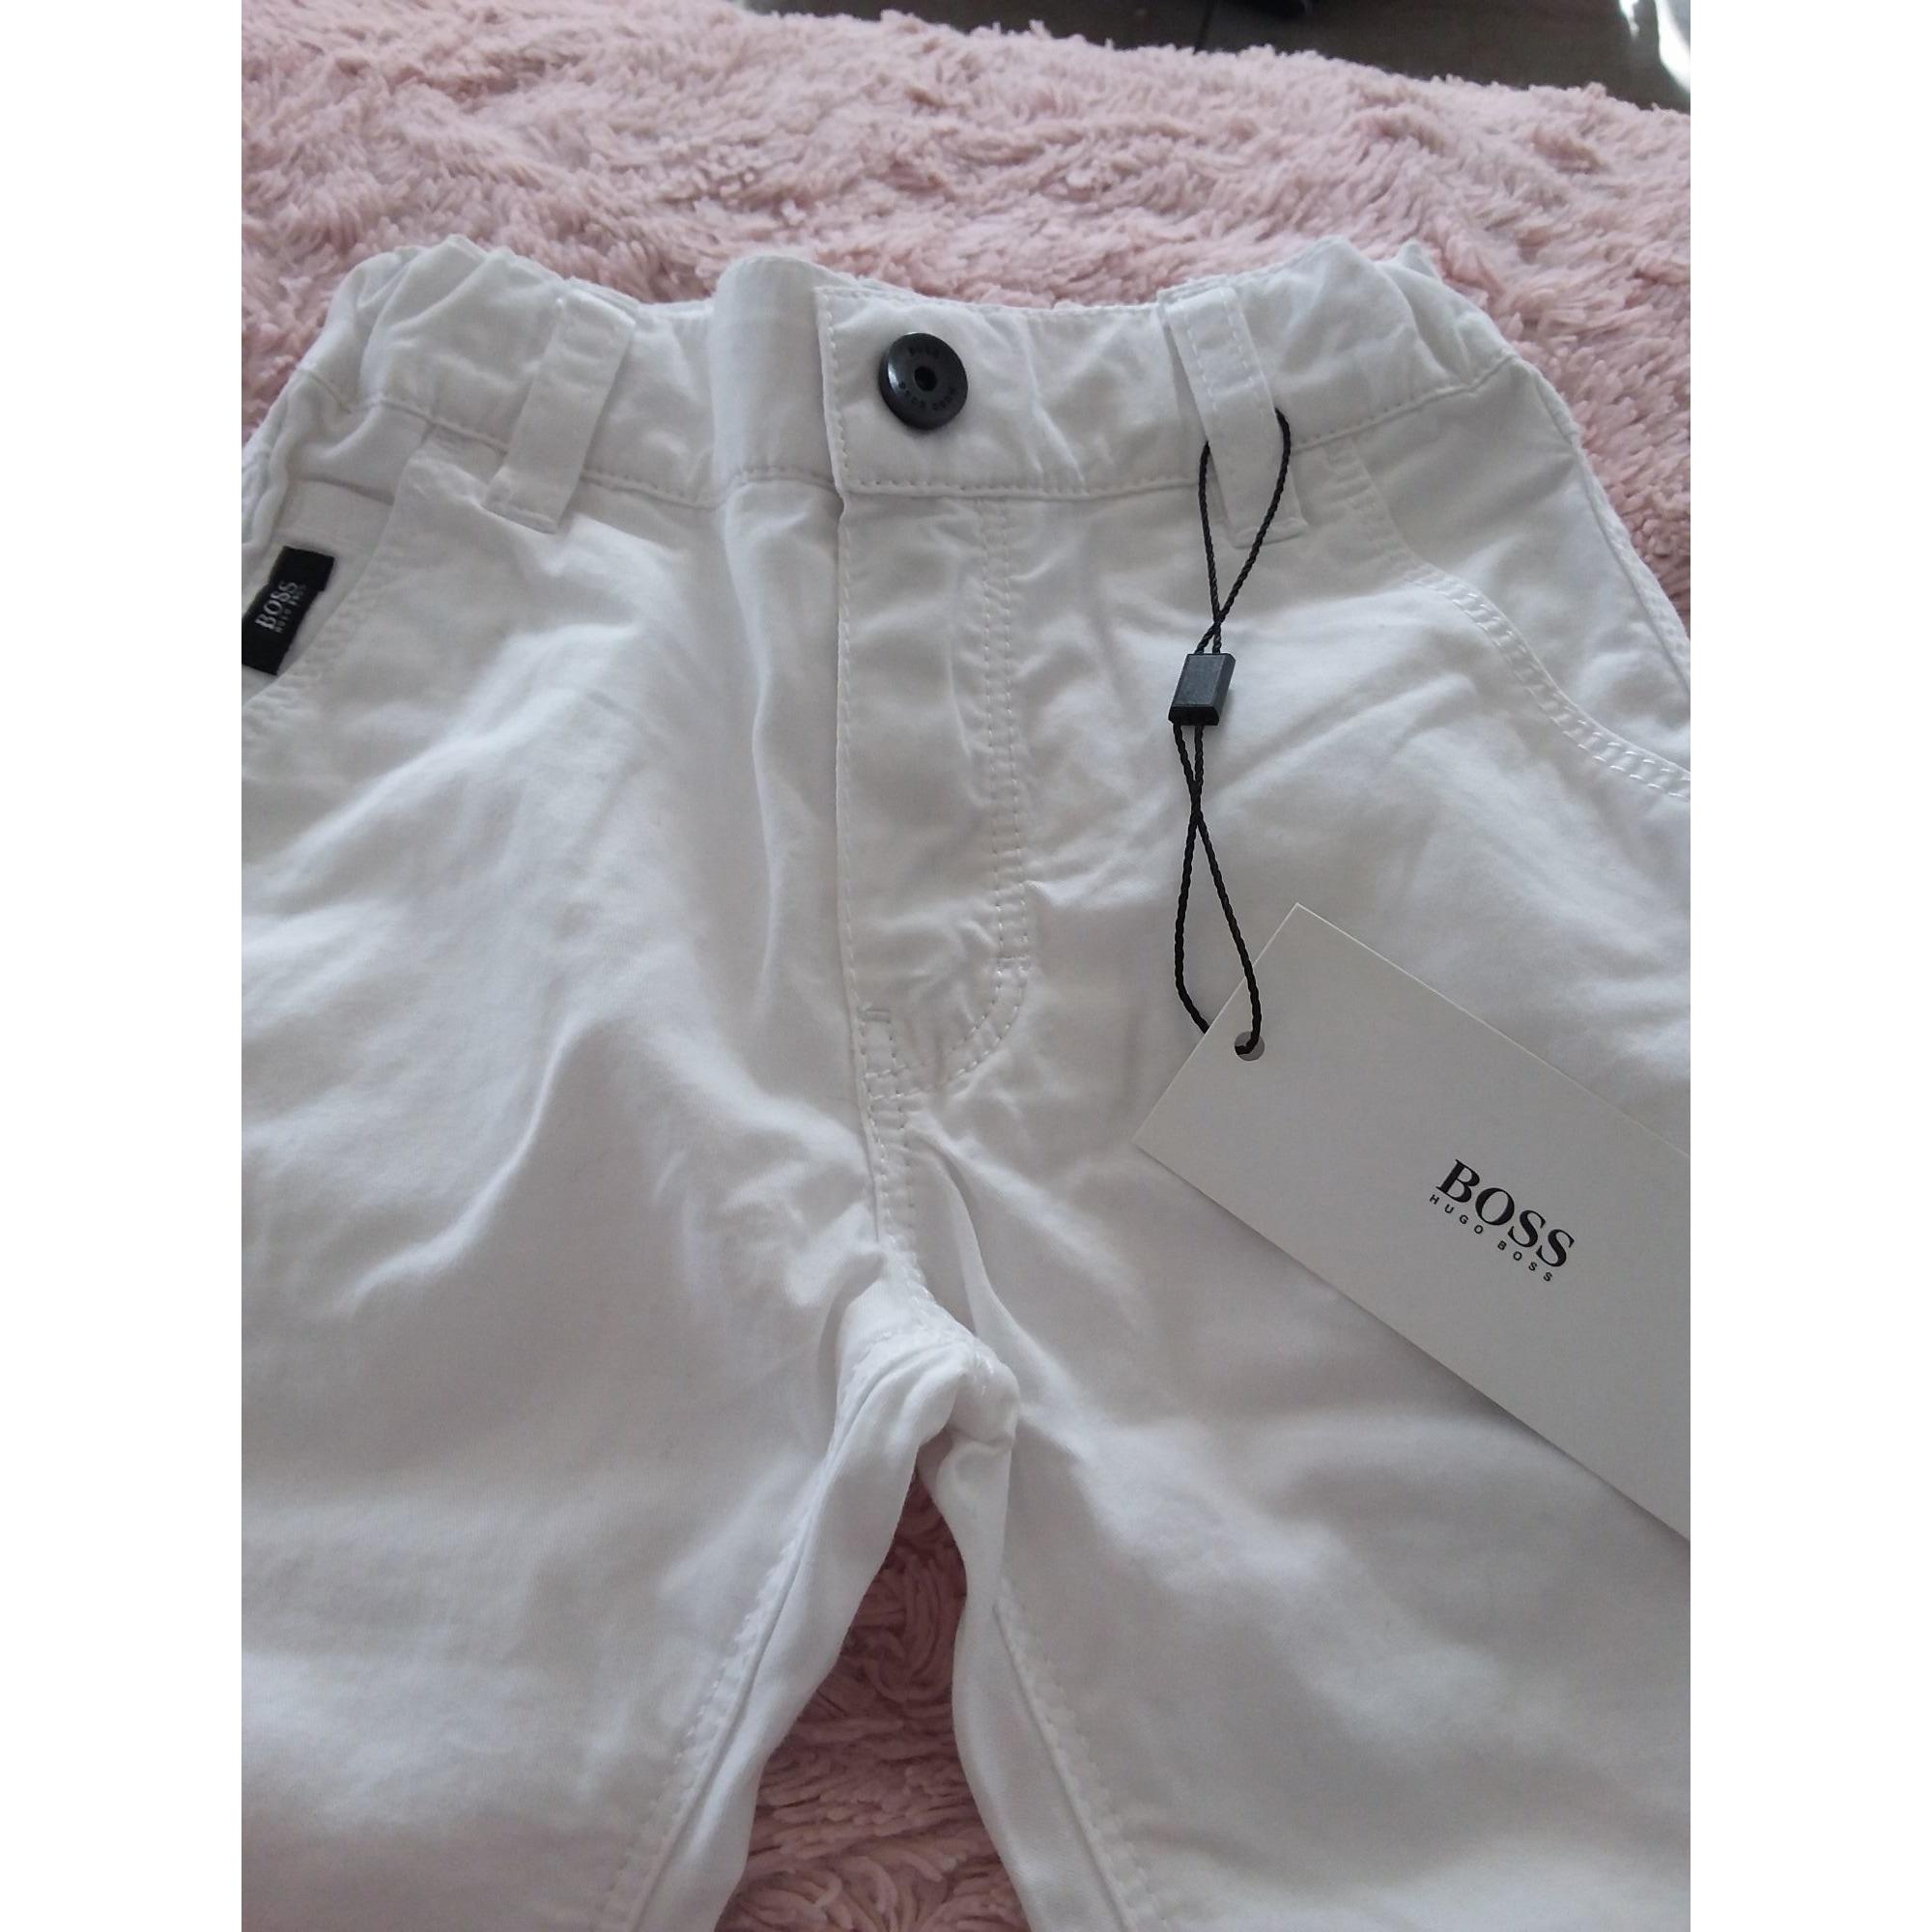 Pantalon HUGO BOSS Blanc, blanc cassé, écru